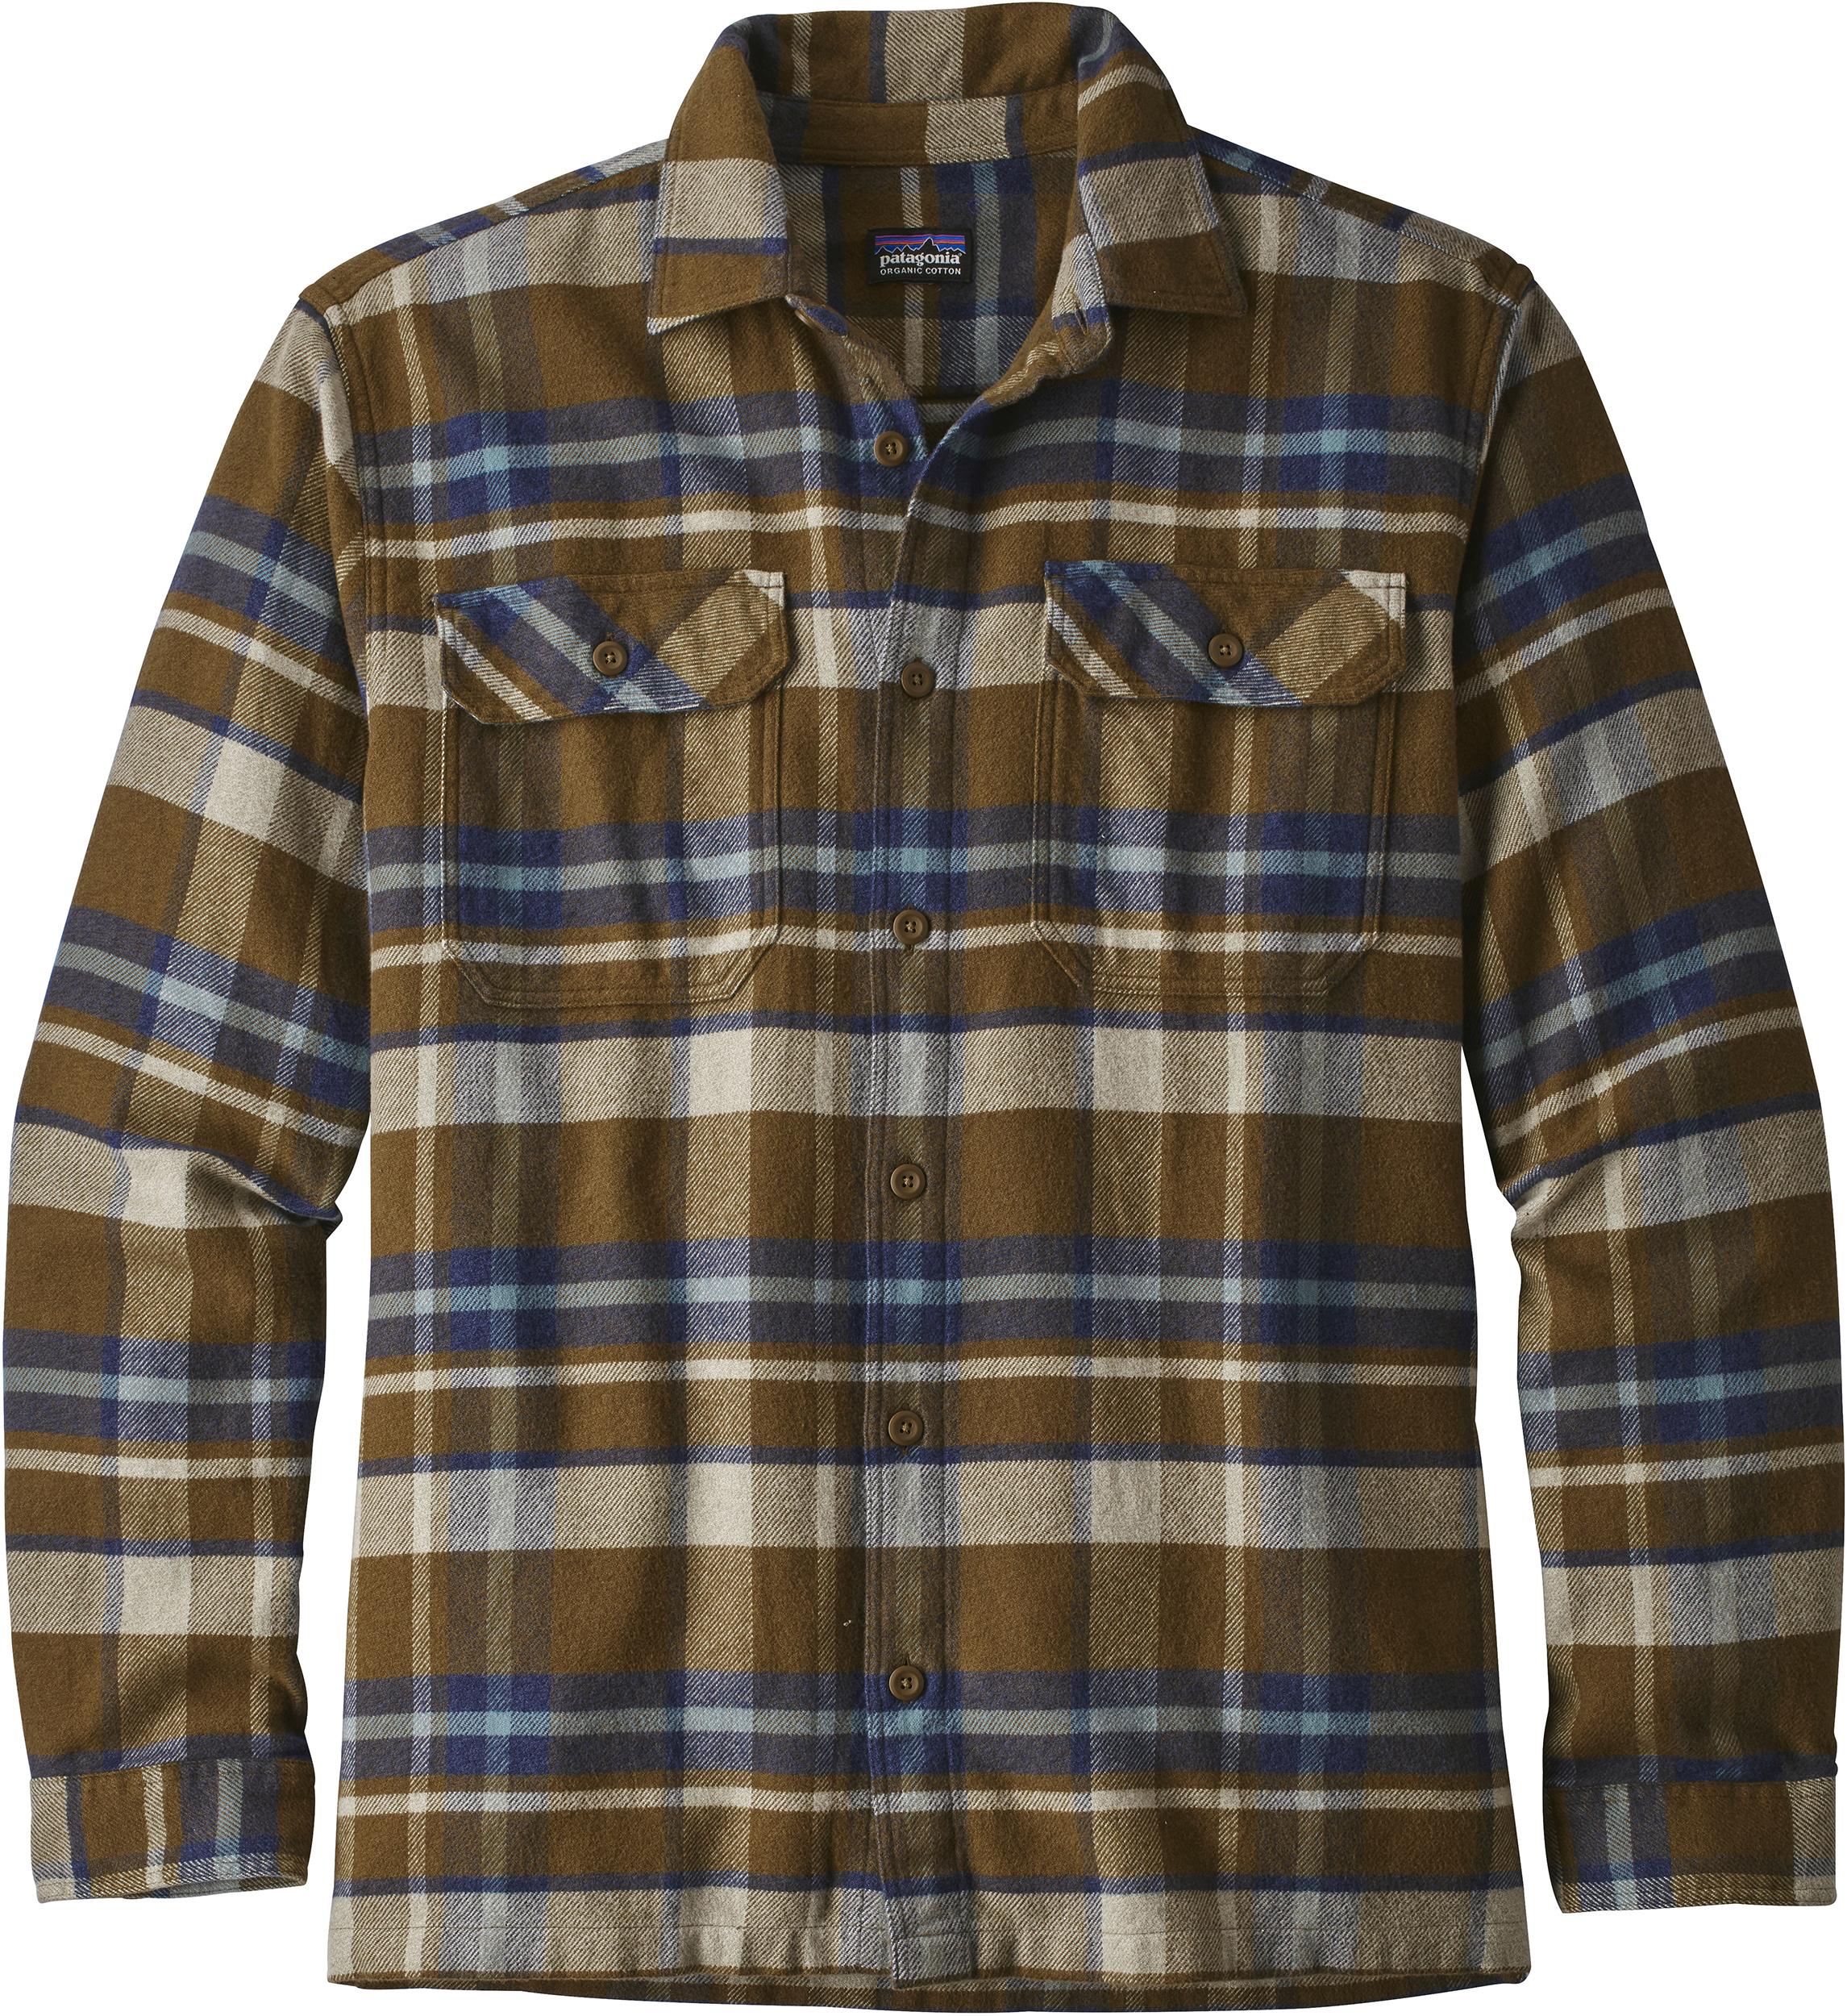 01a7eb2af5ff Patagonia Fjord Flannel Shirt - Men s